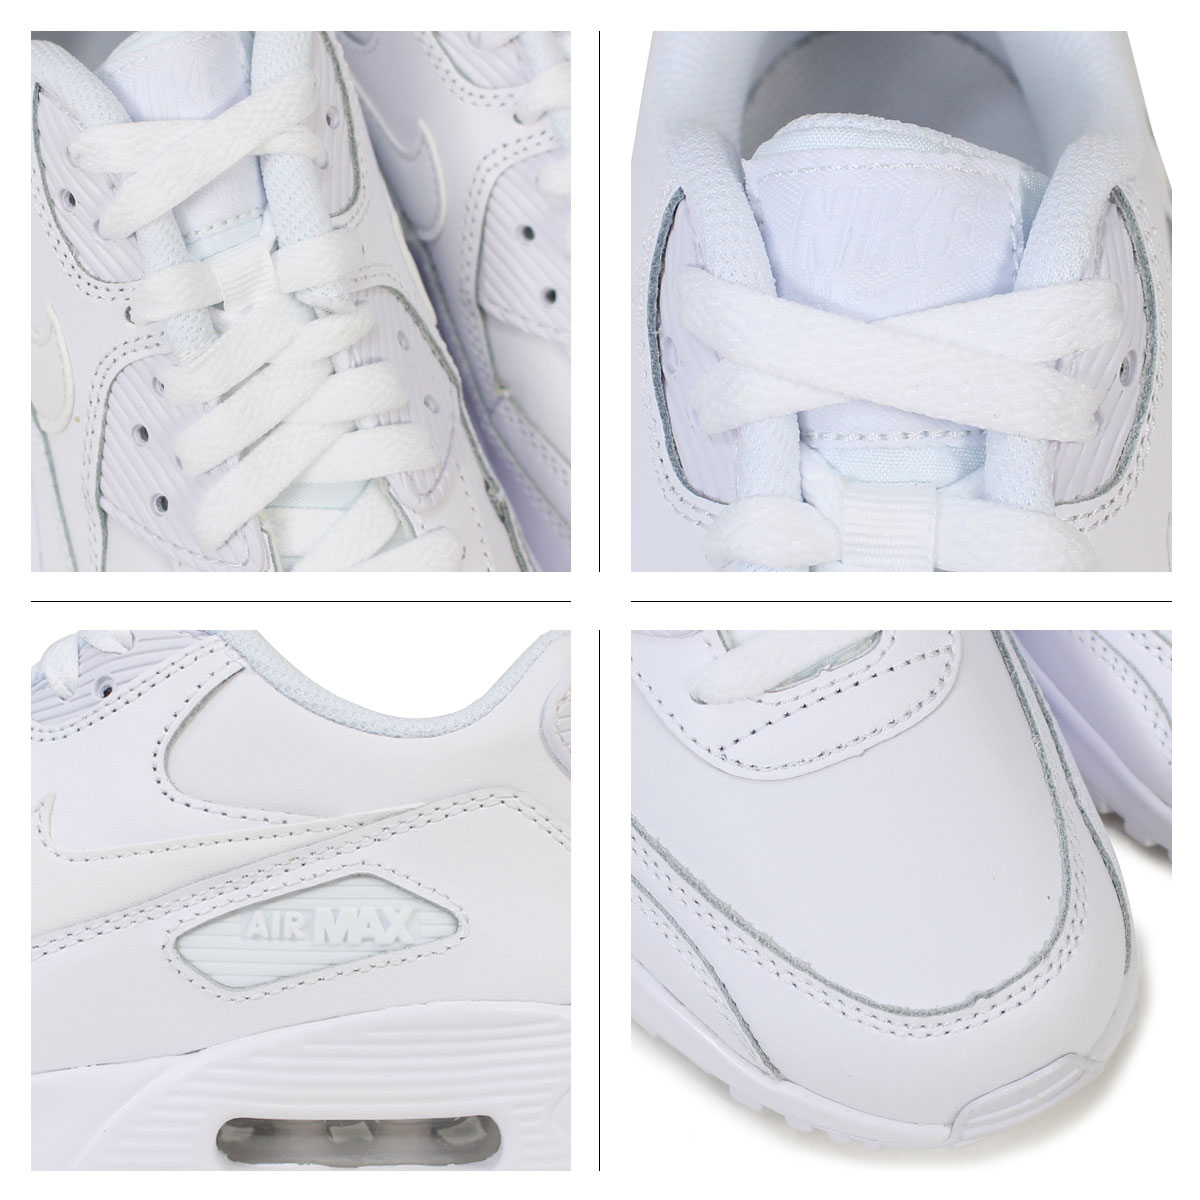 nike air max 90 white leather womens